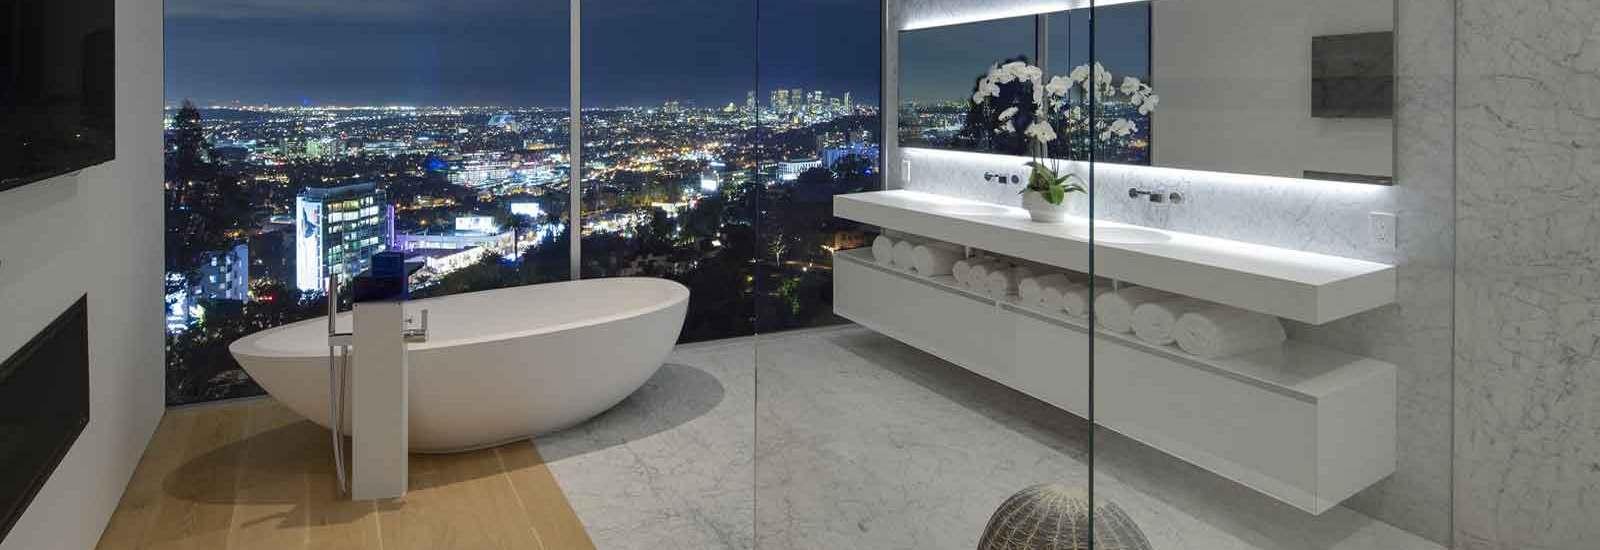 7 Dream Bathrooms With Spa Style Luxury Christies International - Villa-in-sardinia-by-antonio-lupi